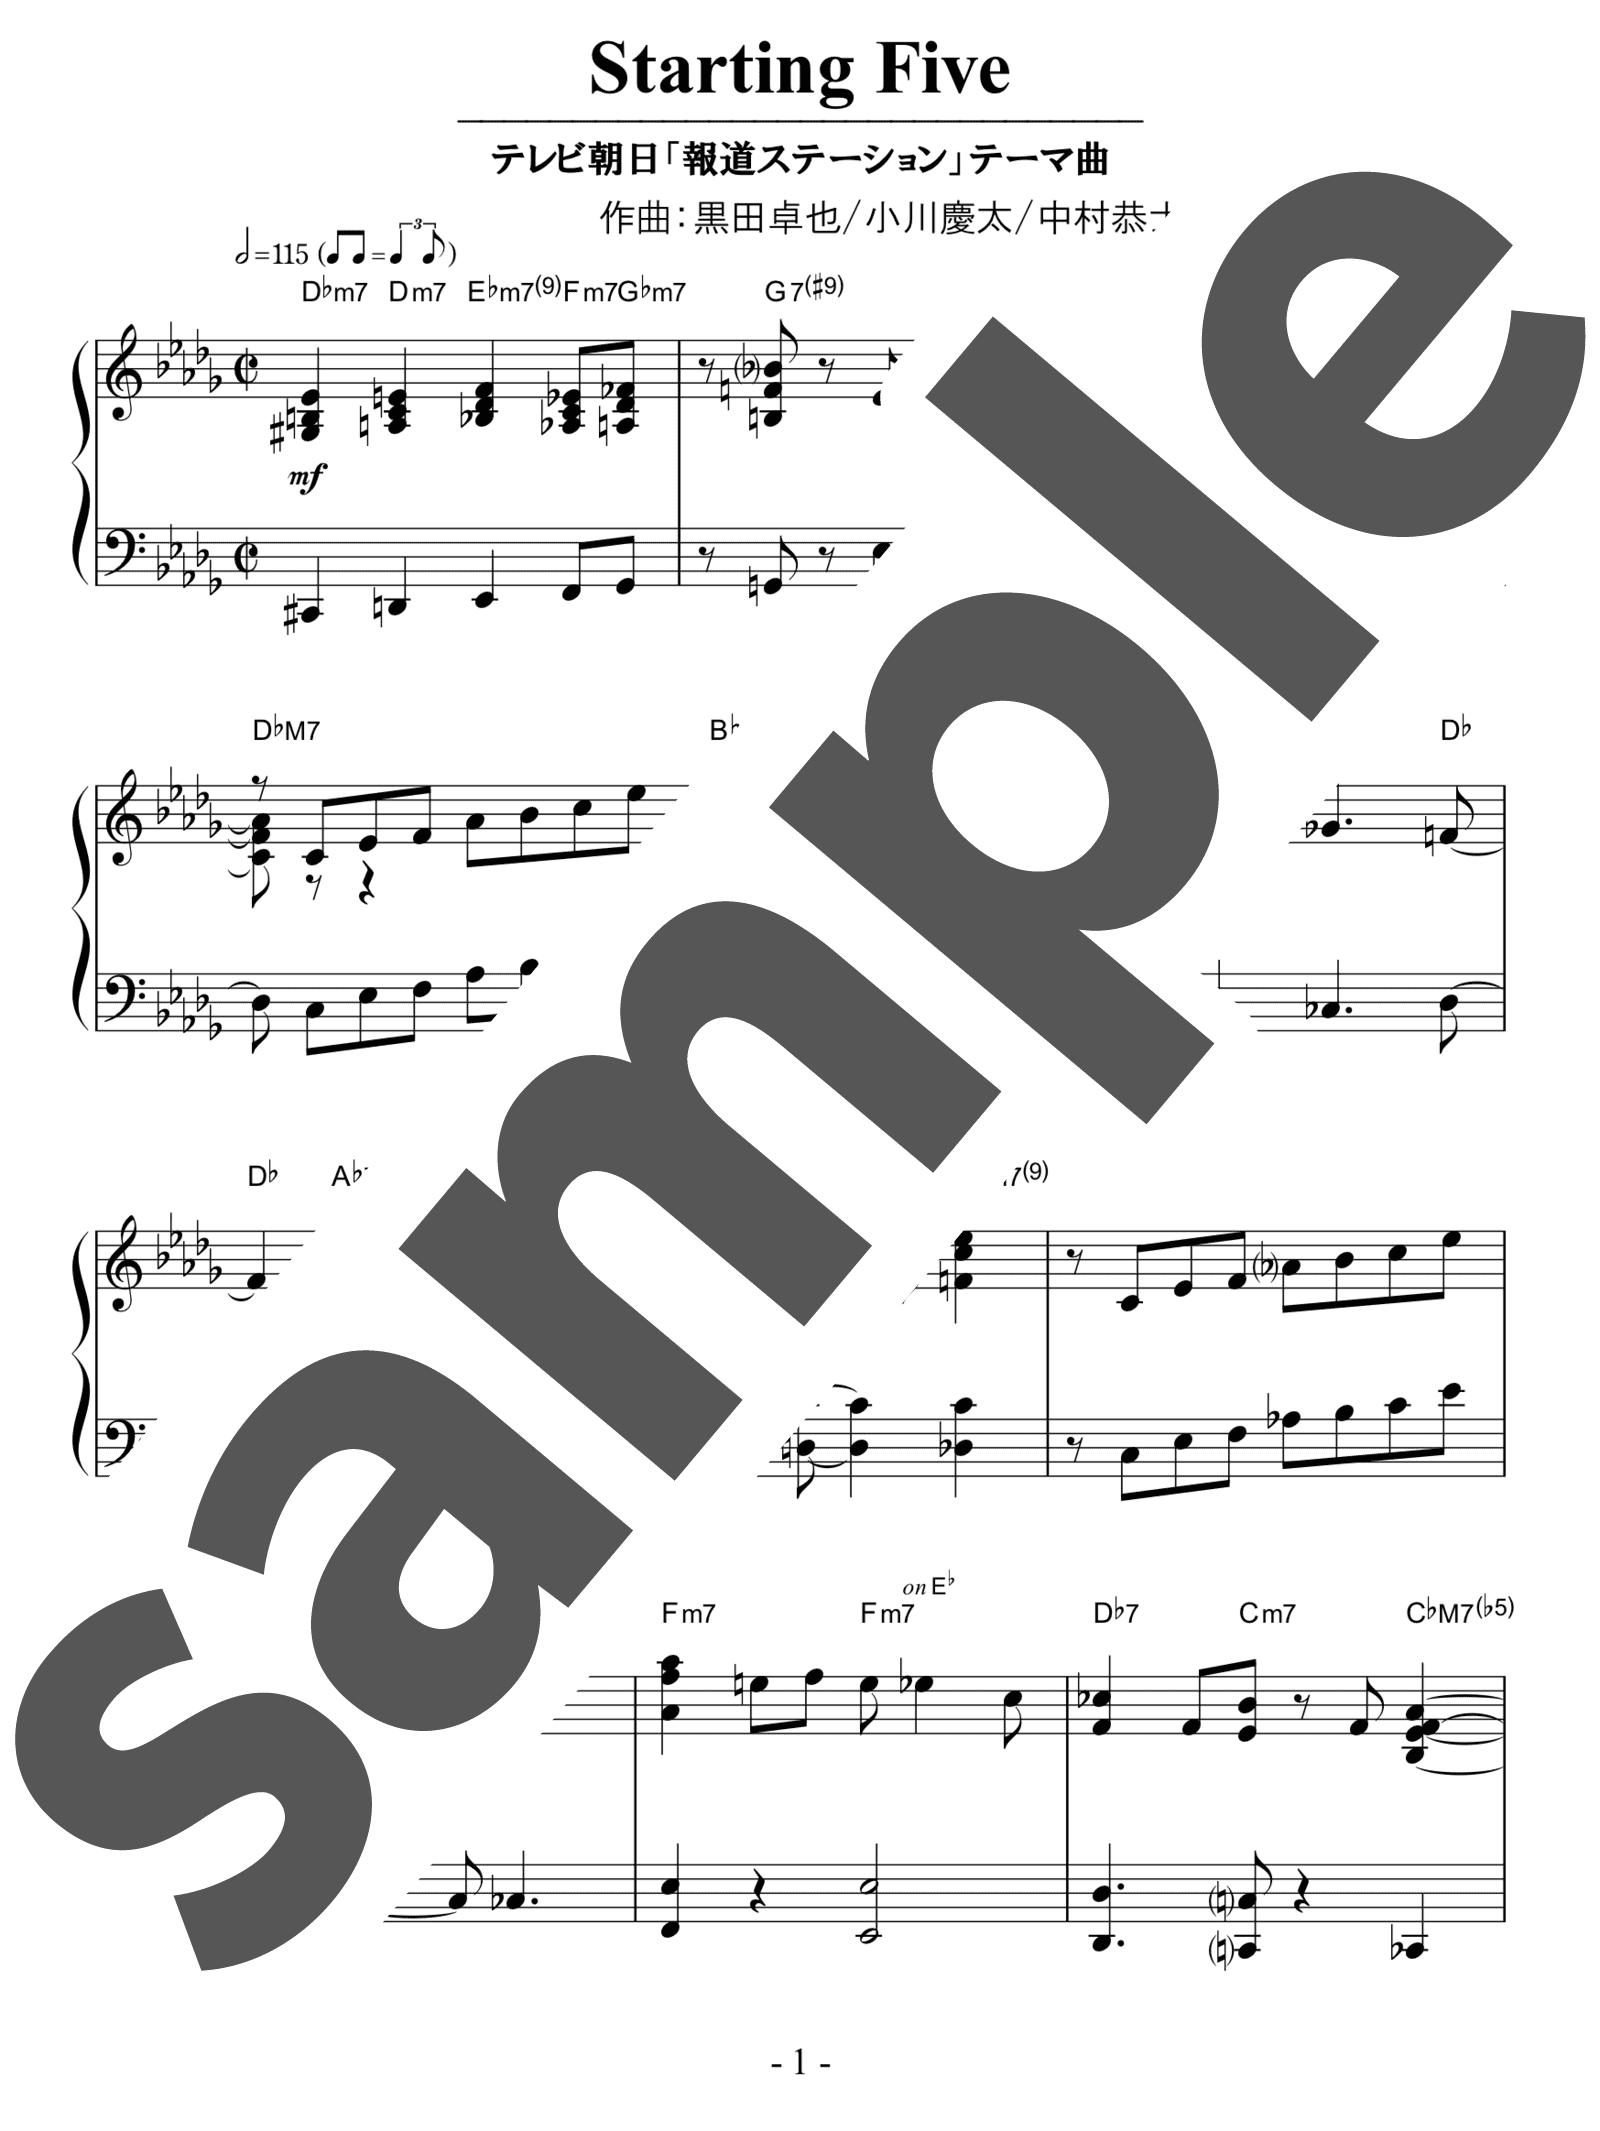 「Starting Five」のサンプル楽譜